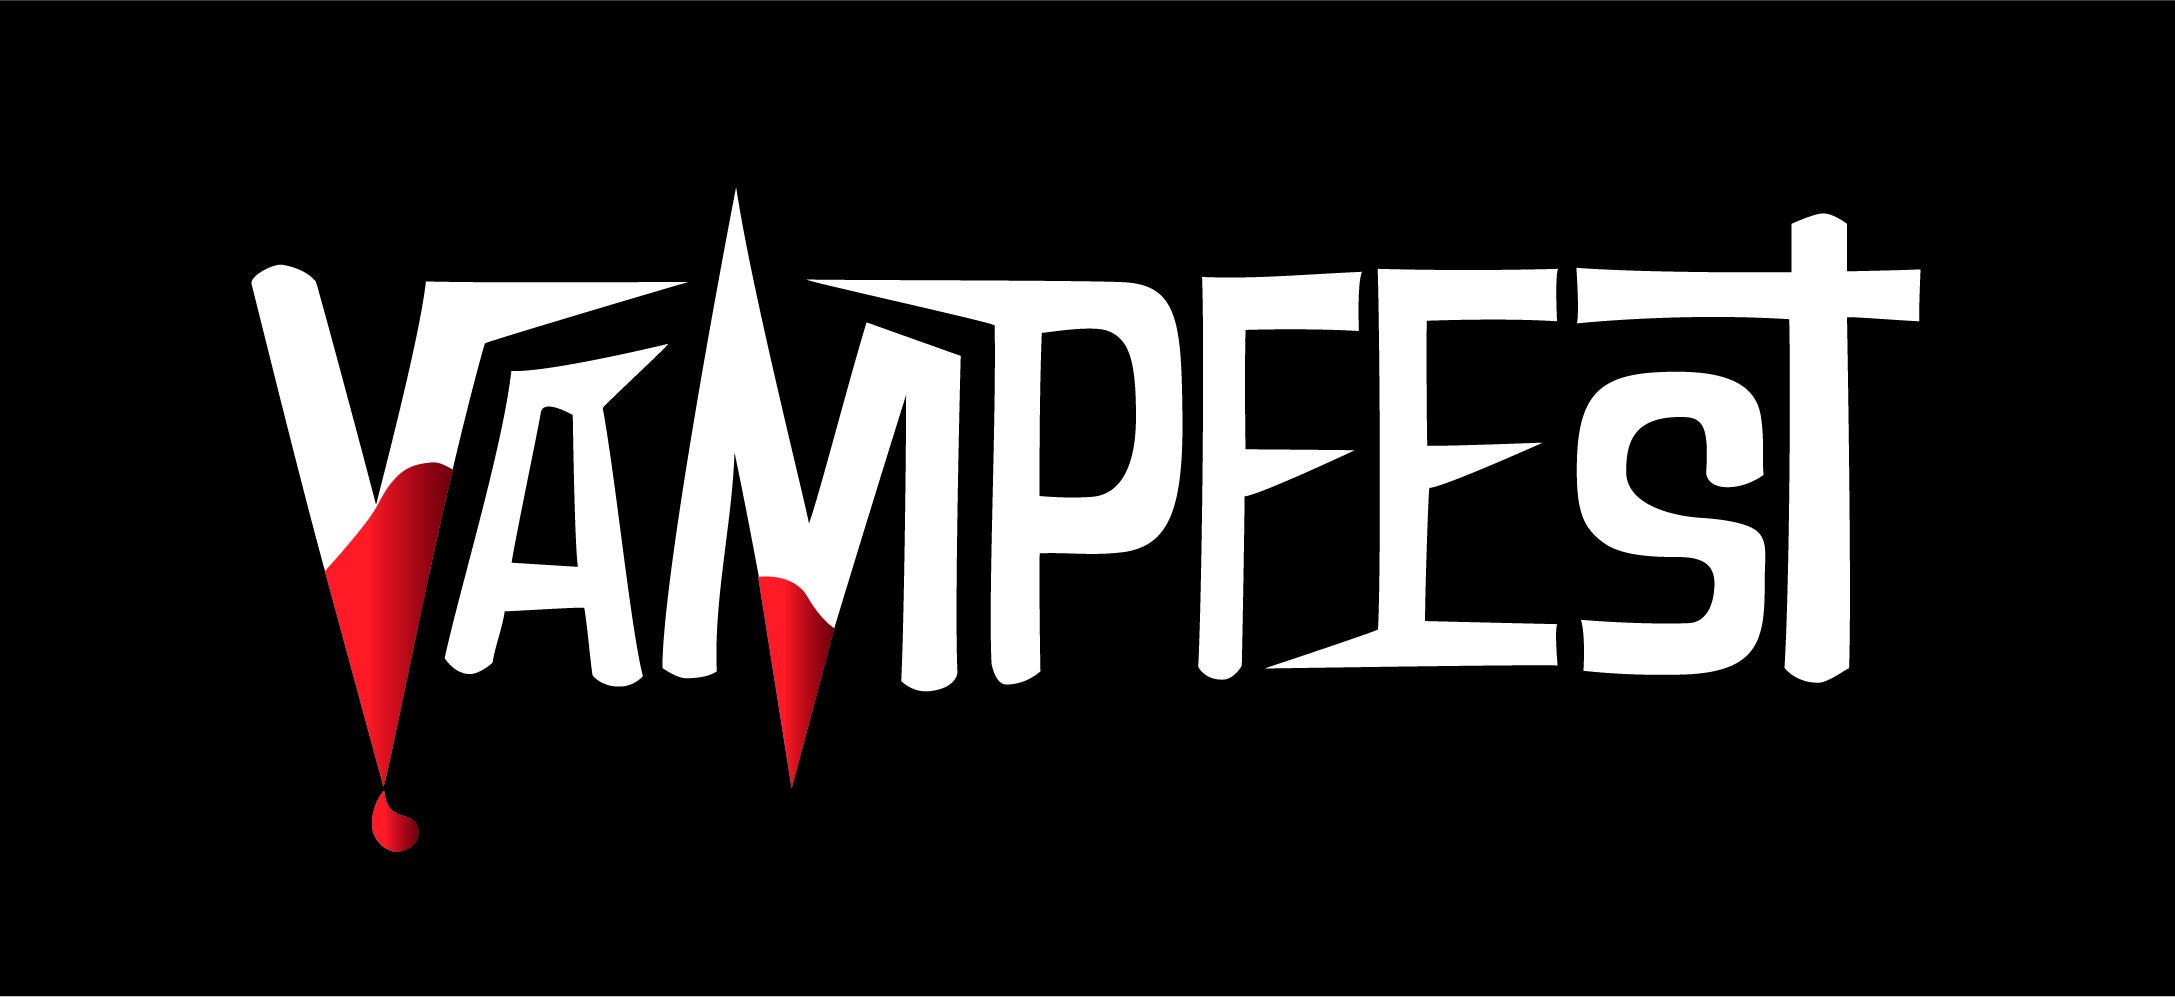 VampFest: The Third International Vampire Film and Arts Festival